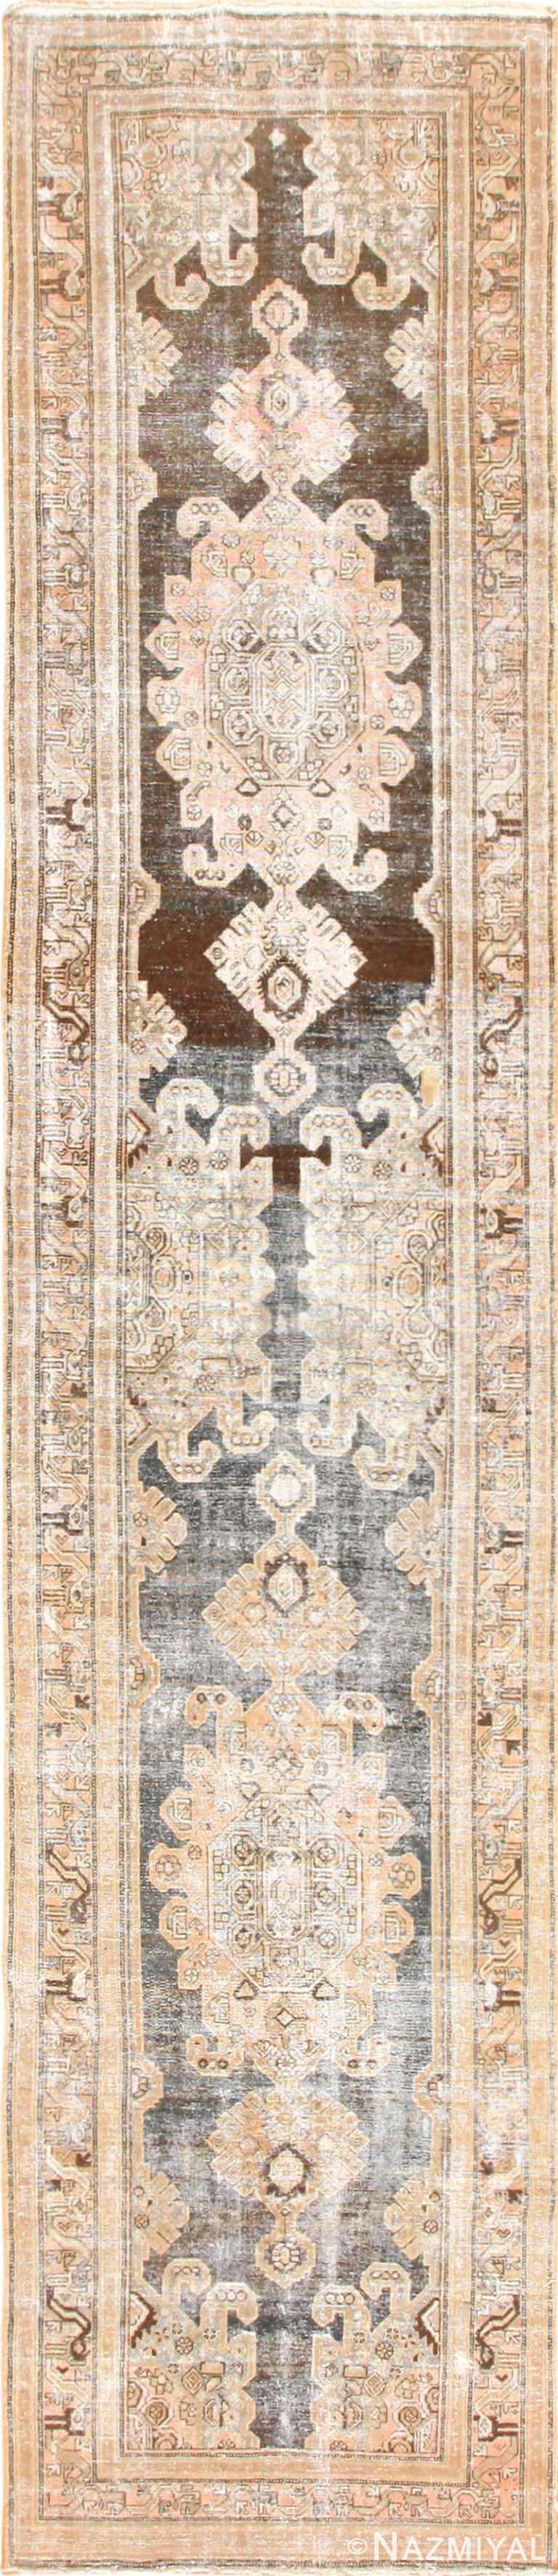 Full view Antique Persian Malayer rug 50043 by Nazmiyal